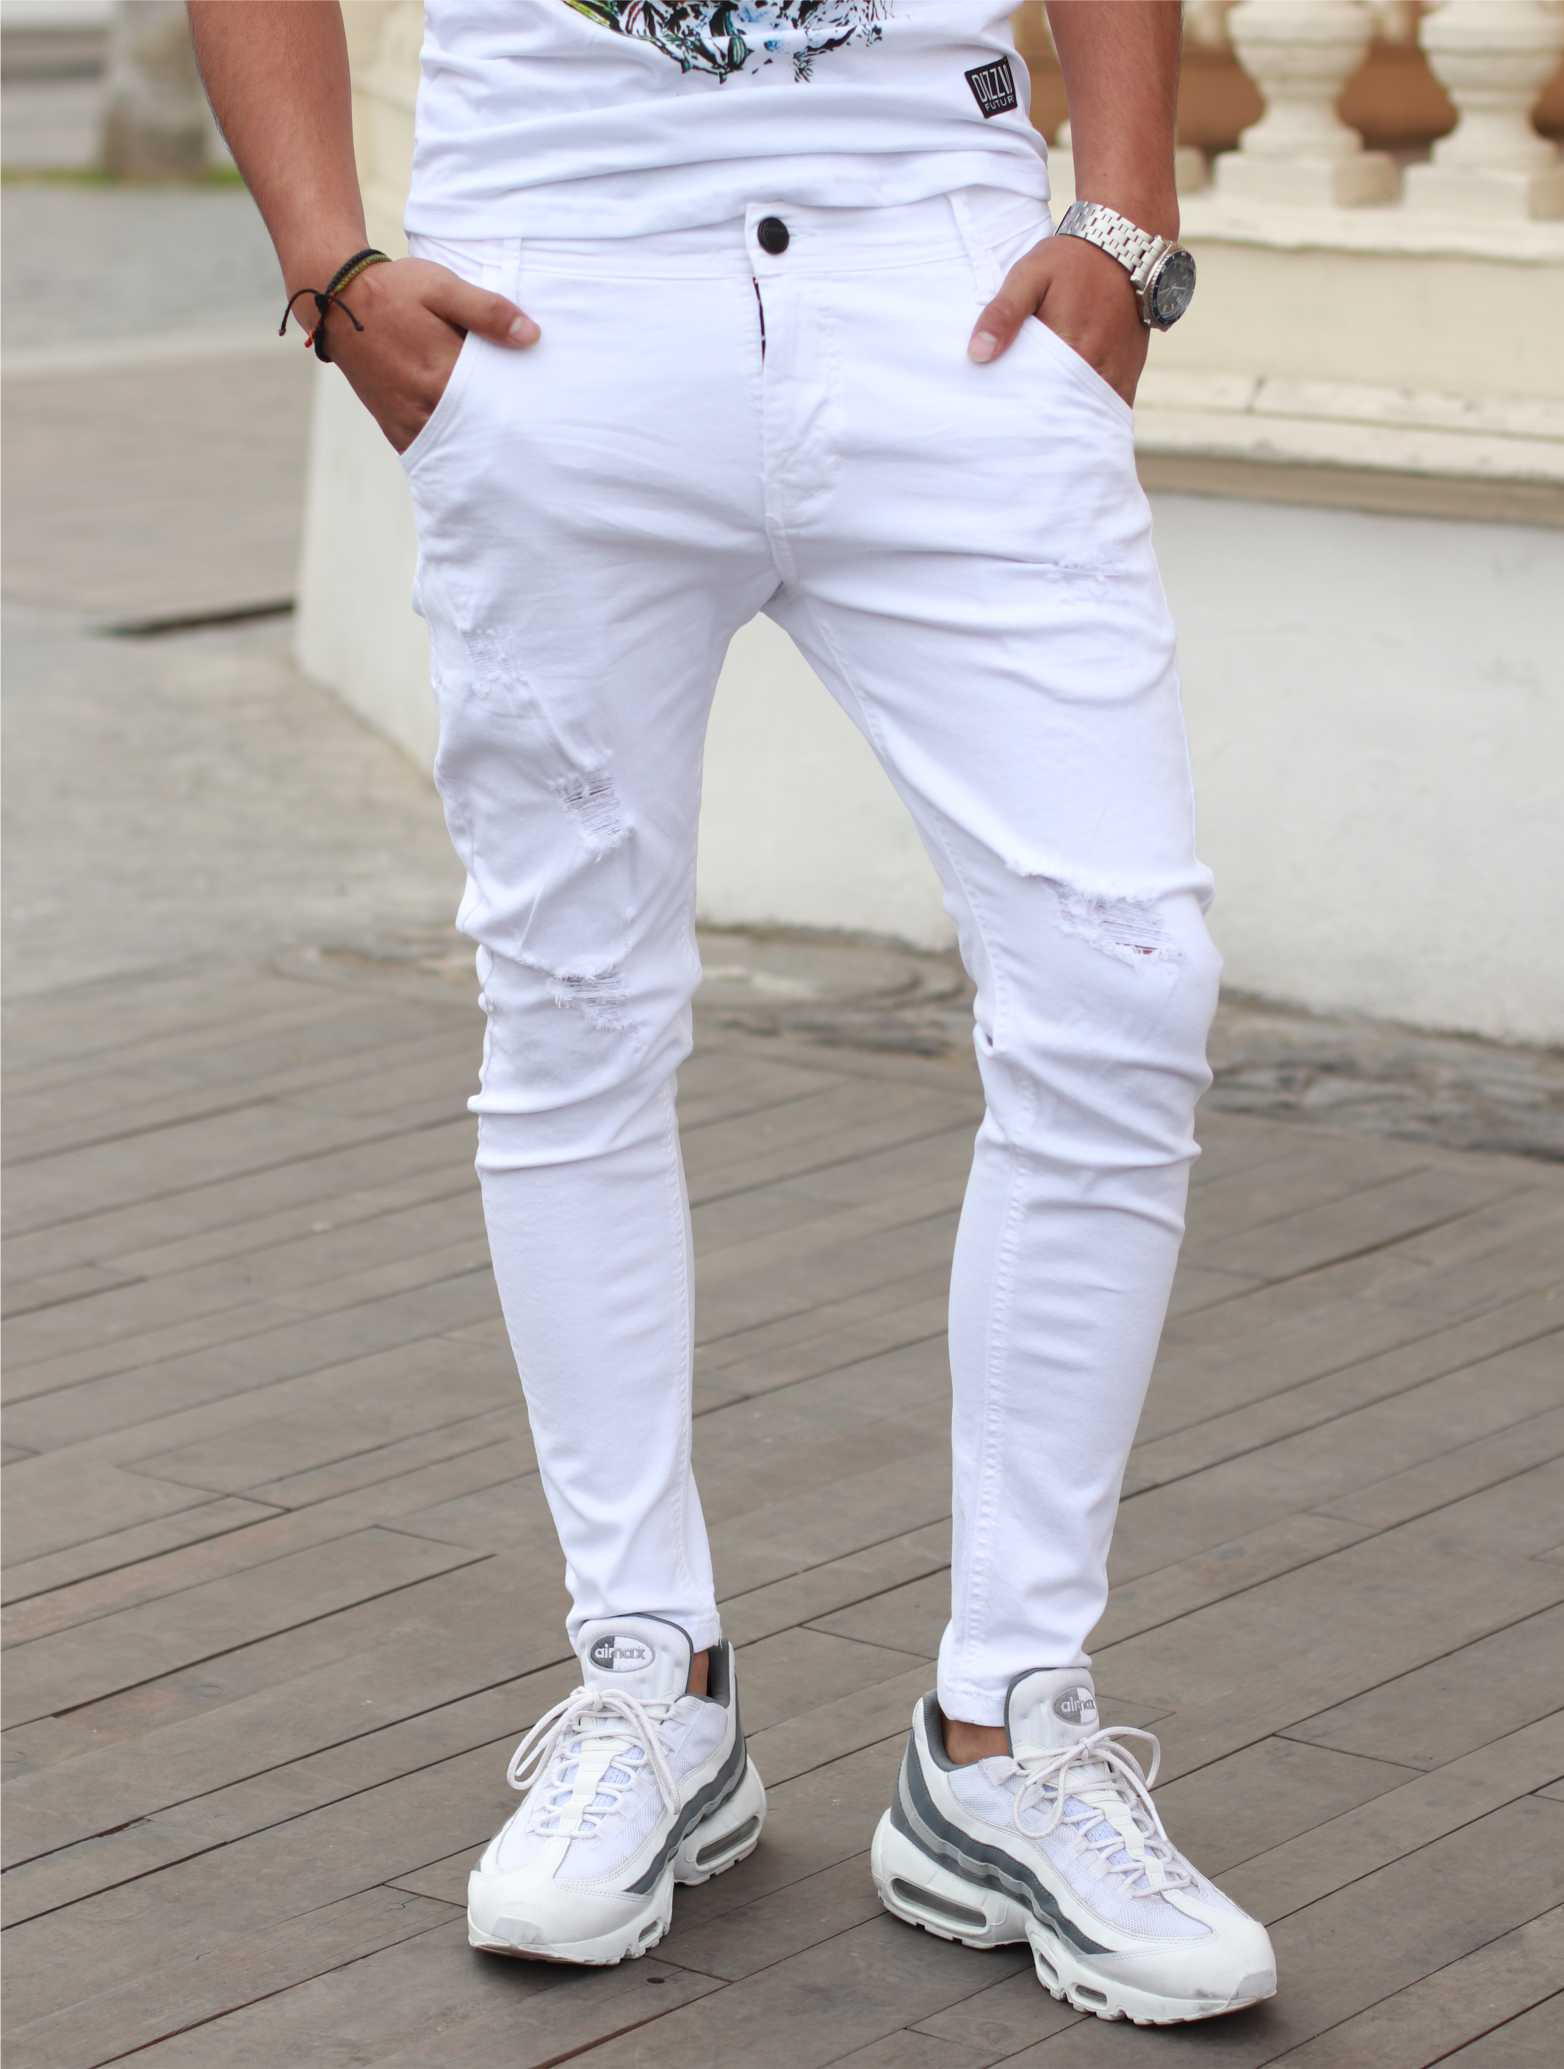 Pantalones Hombre Emporio Fox Rasgado Blanco Jeans Hombre Pantalon